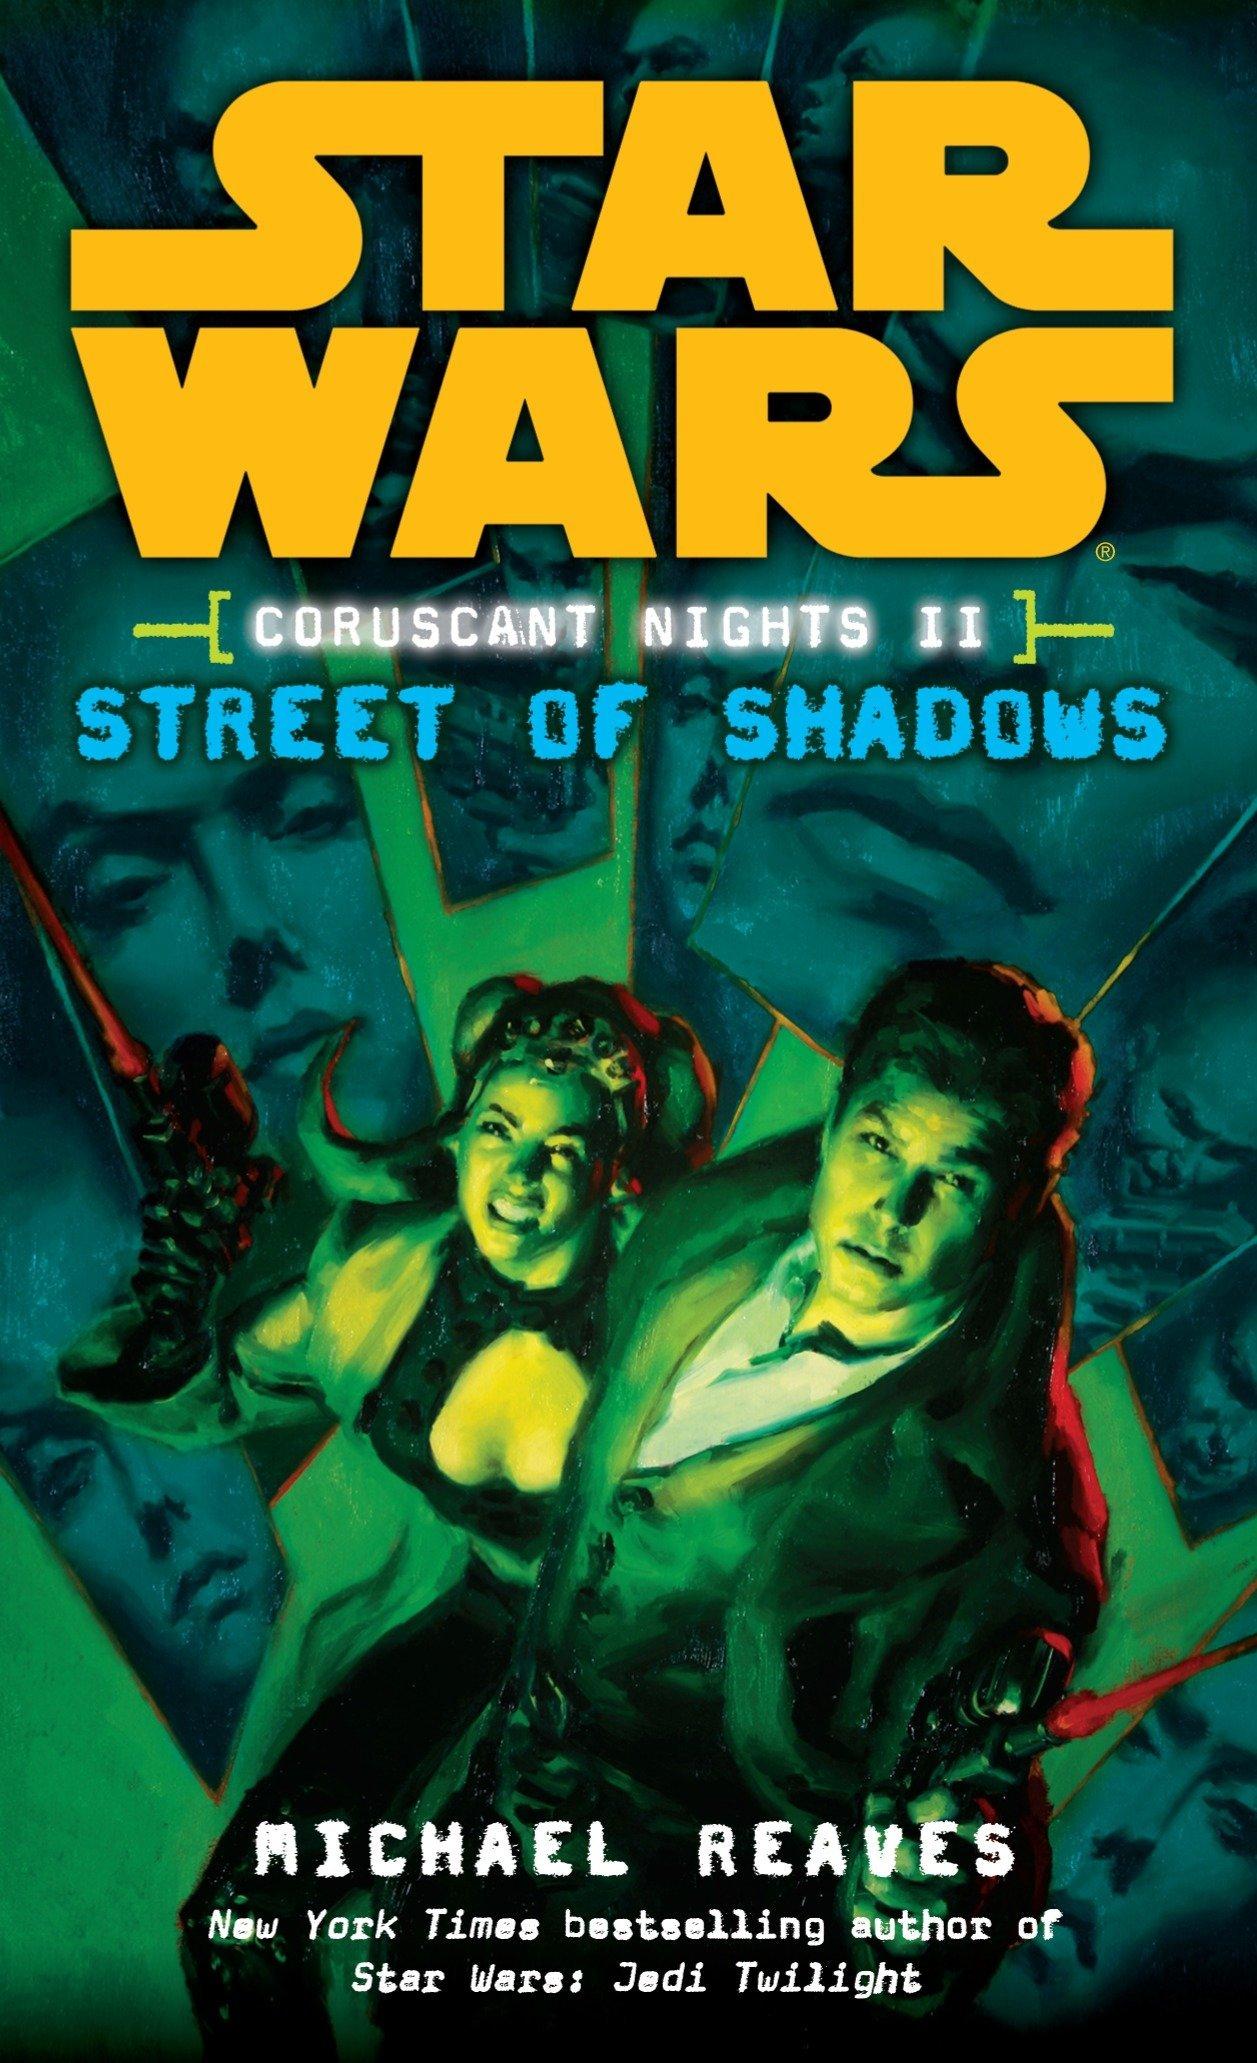 Star Wars Coruscant Nights: Street of Shadows